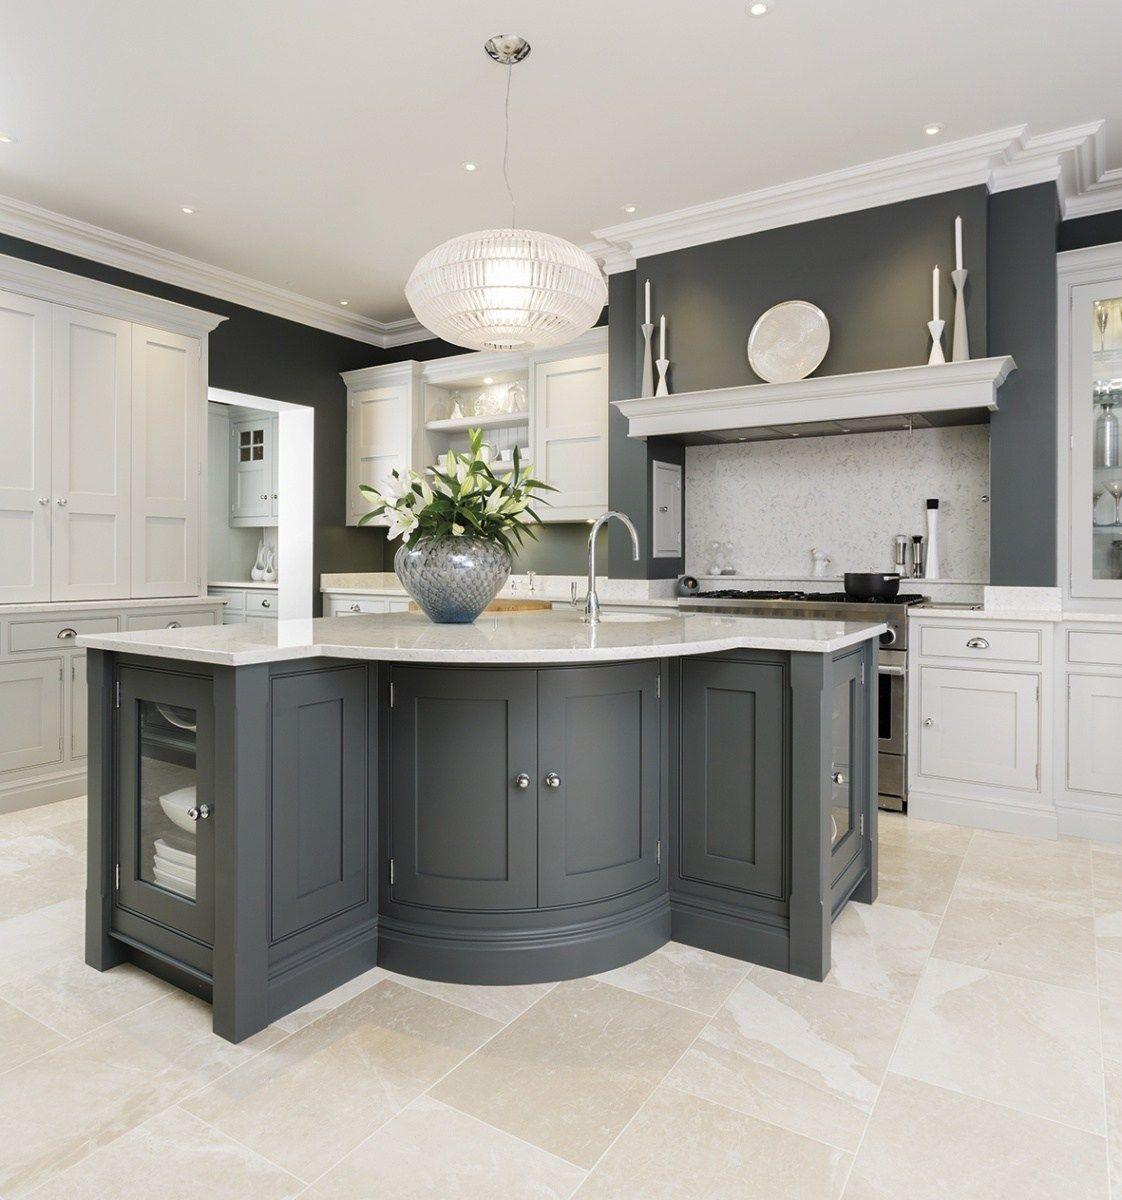 Bespoke Kitchen Designs: Luxury Kitchen Designer Tom Howley Opened Showroom